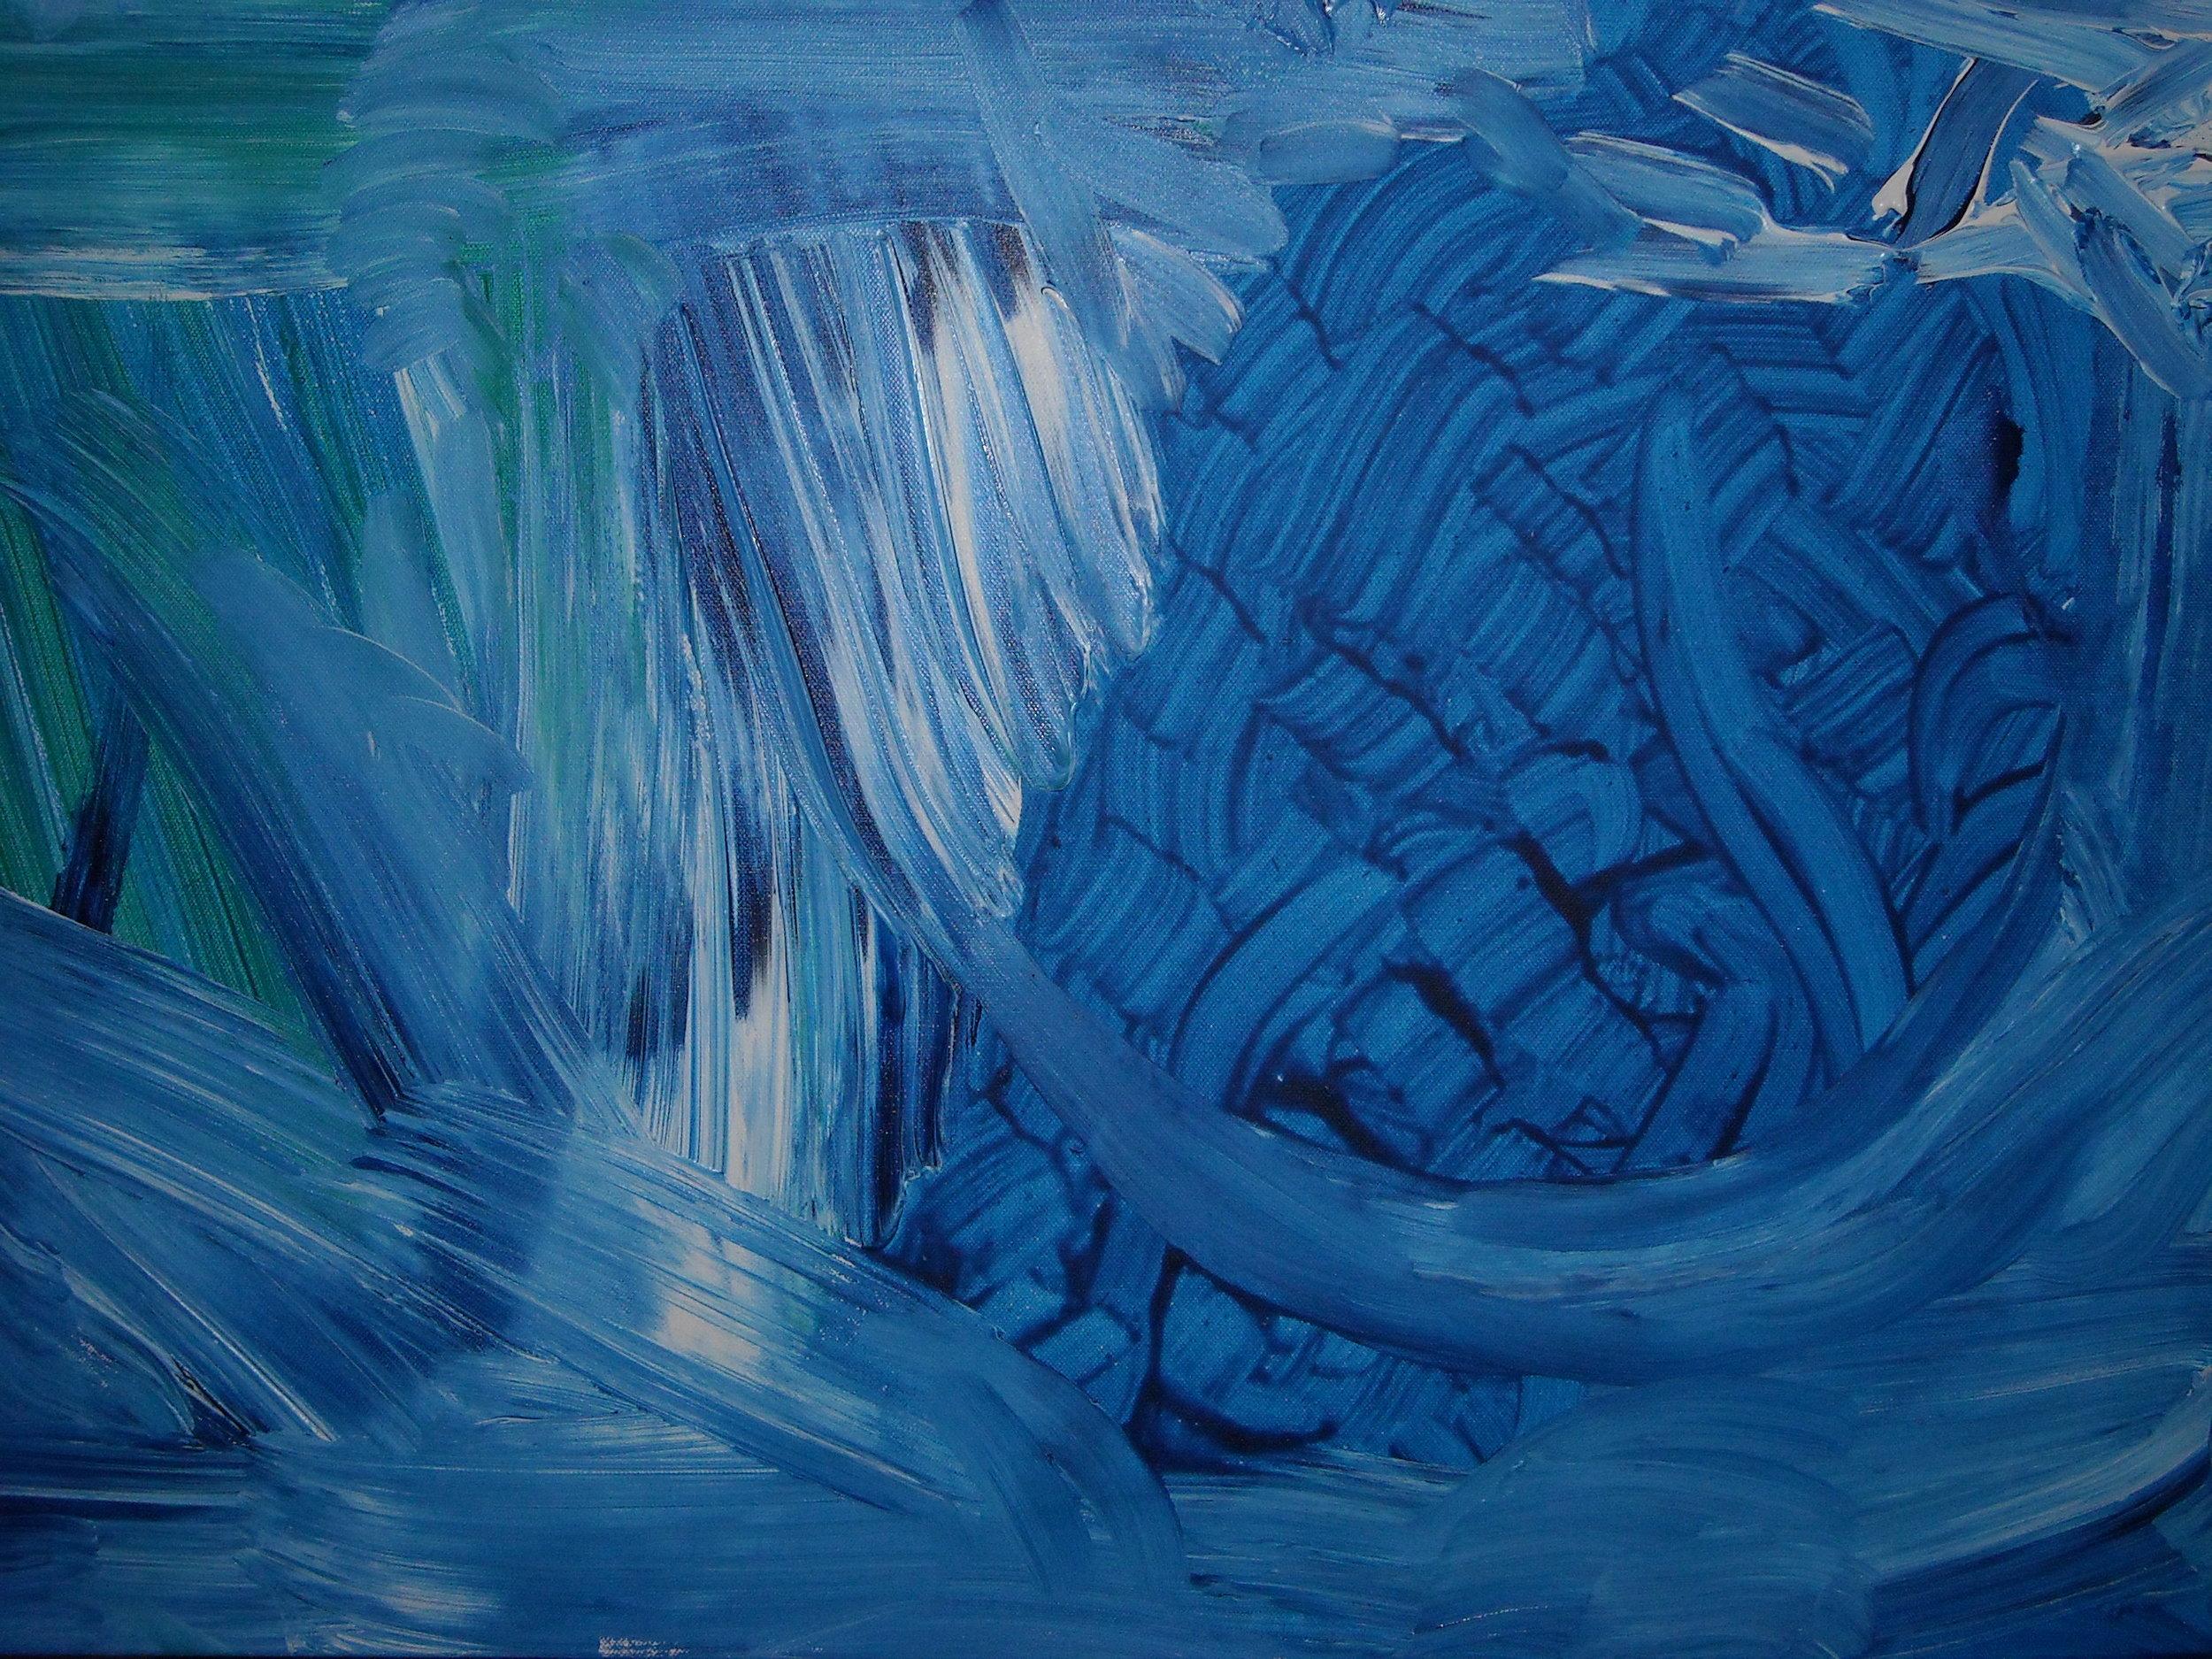 BLUE ABSTRACTION, ACRYLIC ON CANVAS, 60 X 70CM